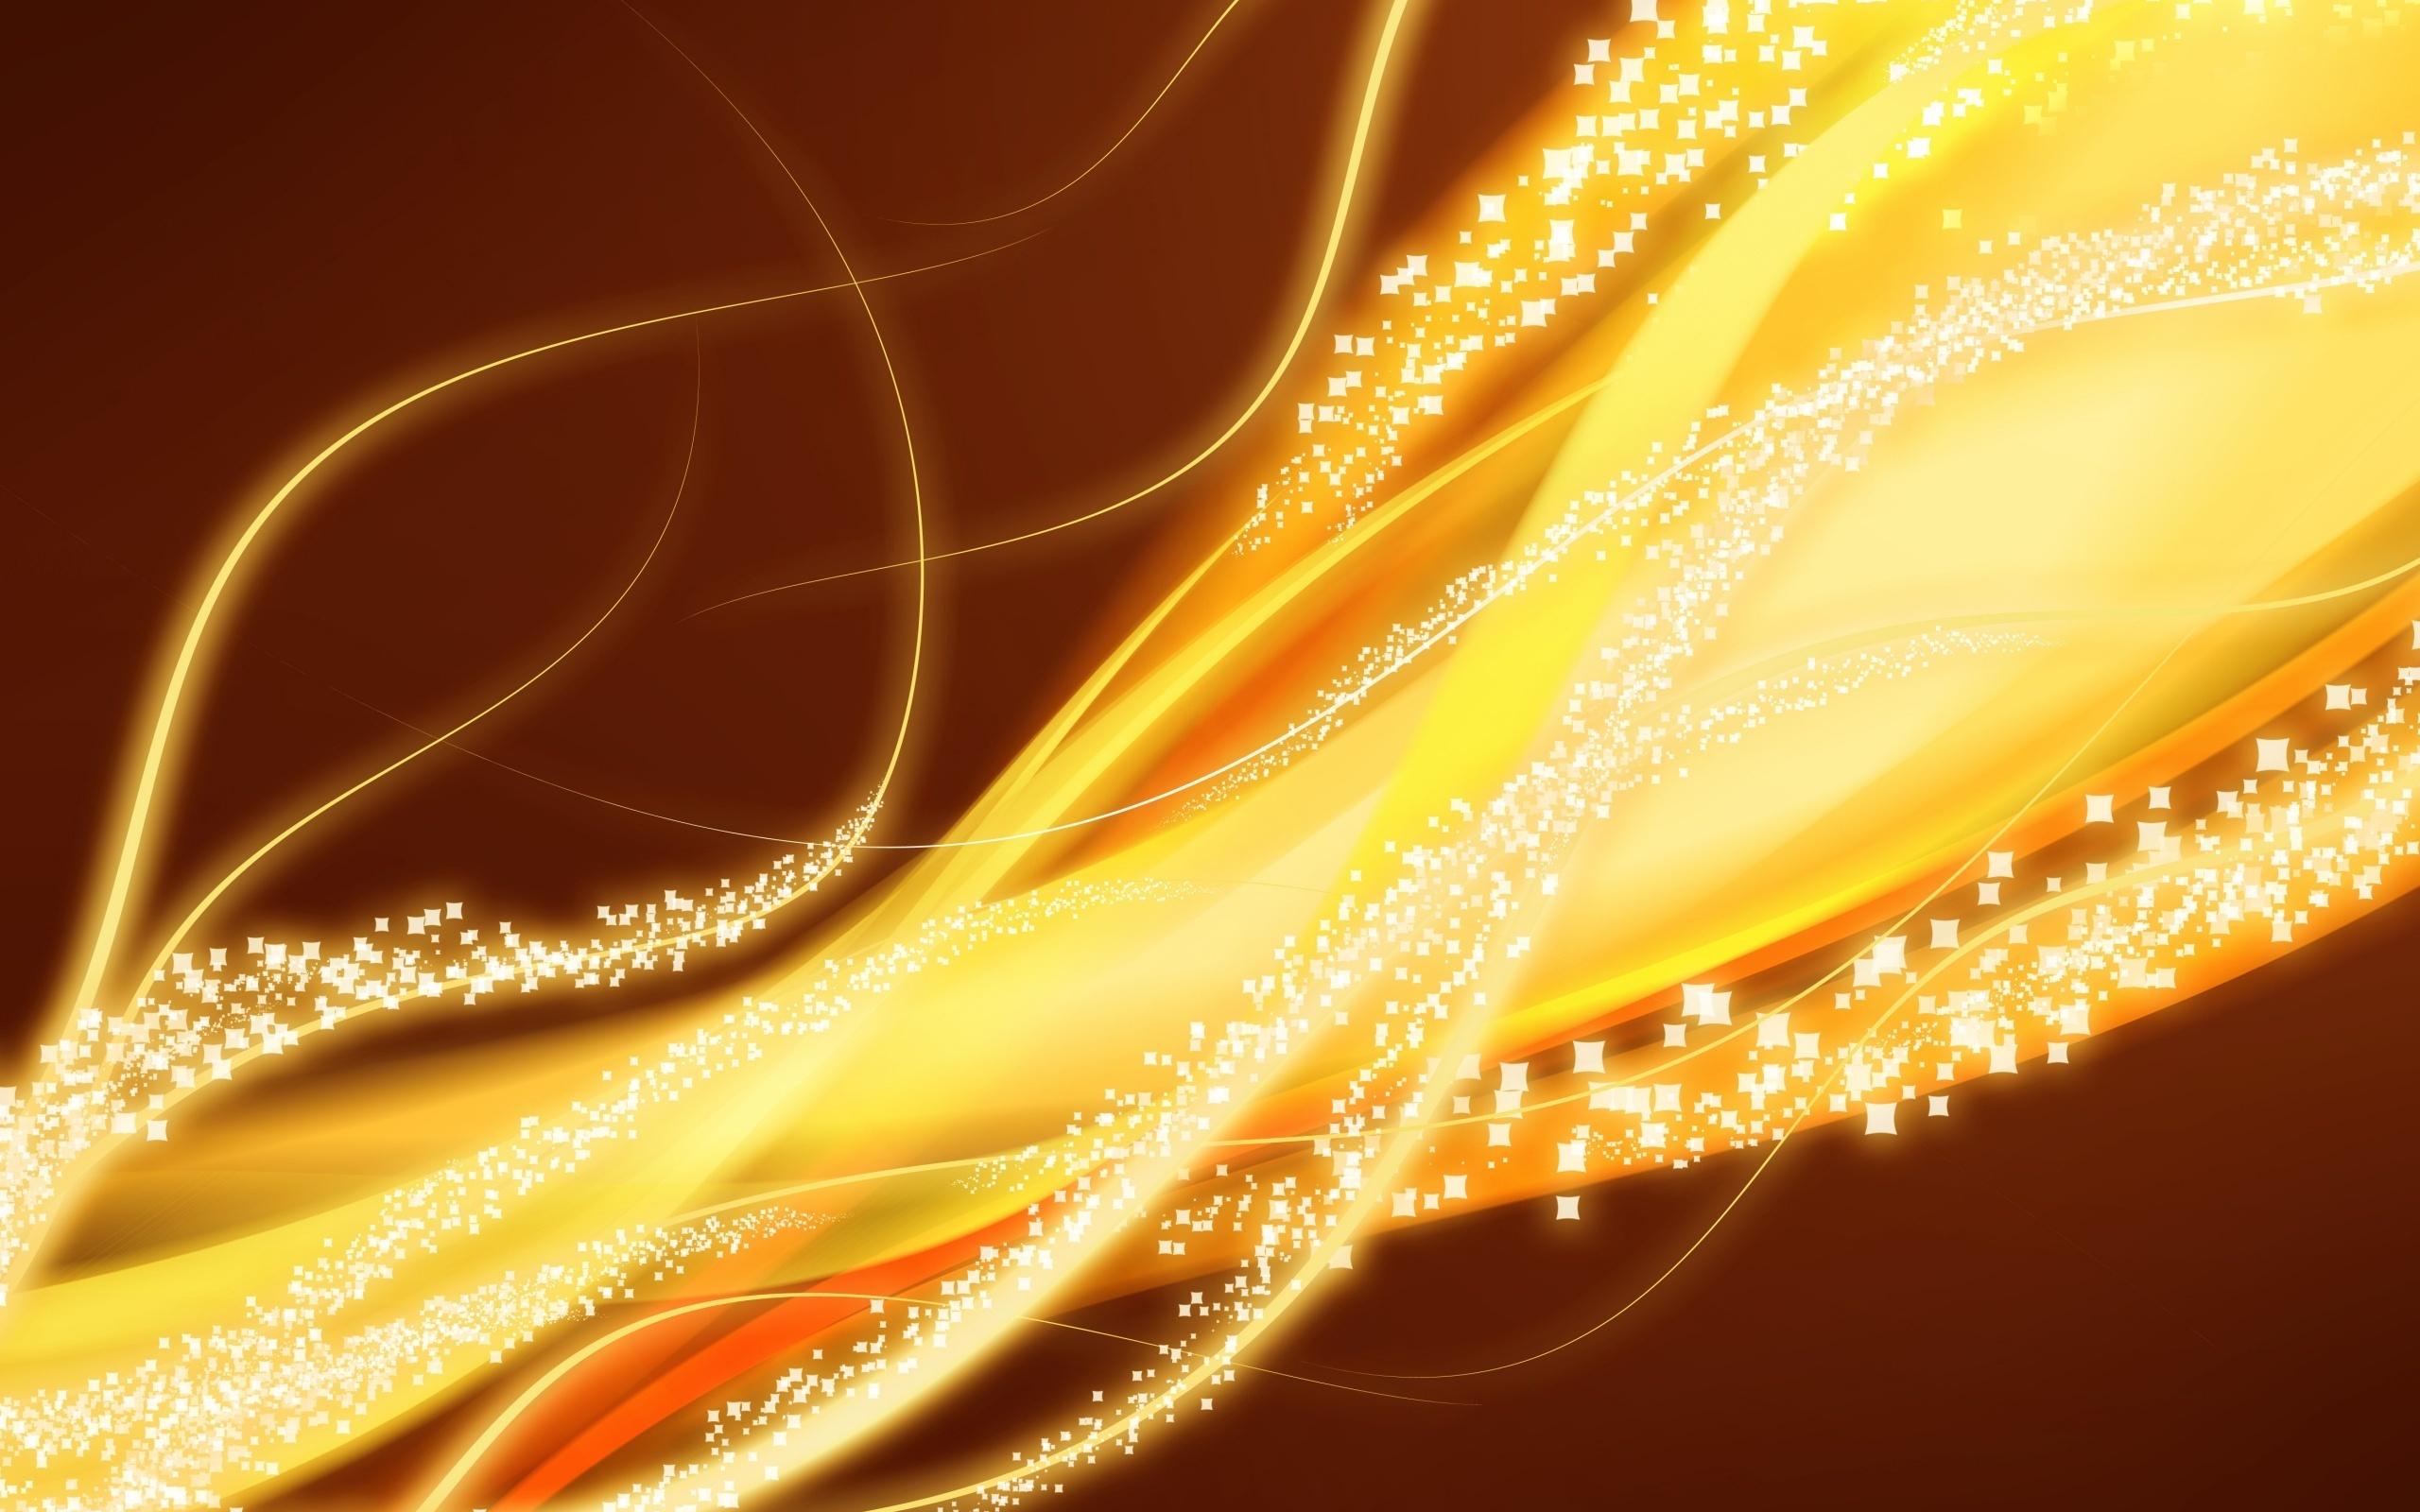 Yellow HD Wallpaper | Background Image | 2560x1600 | ID ...